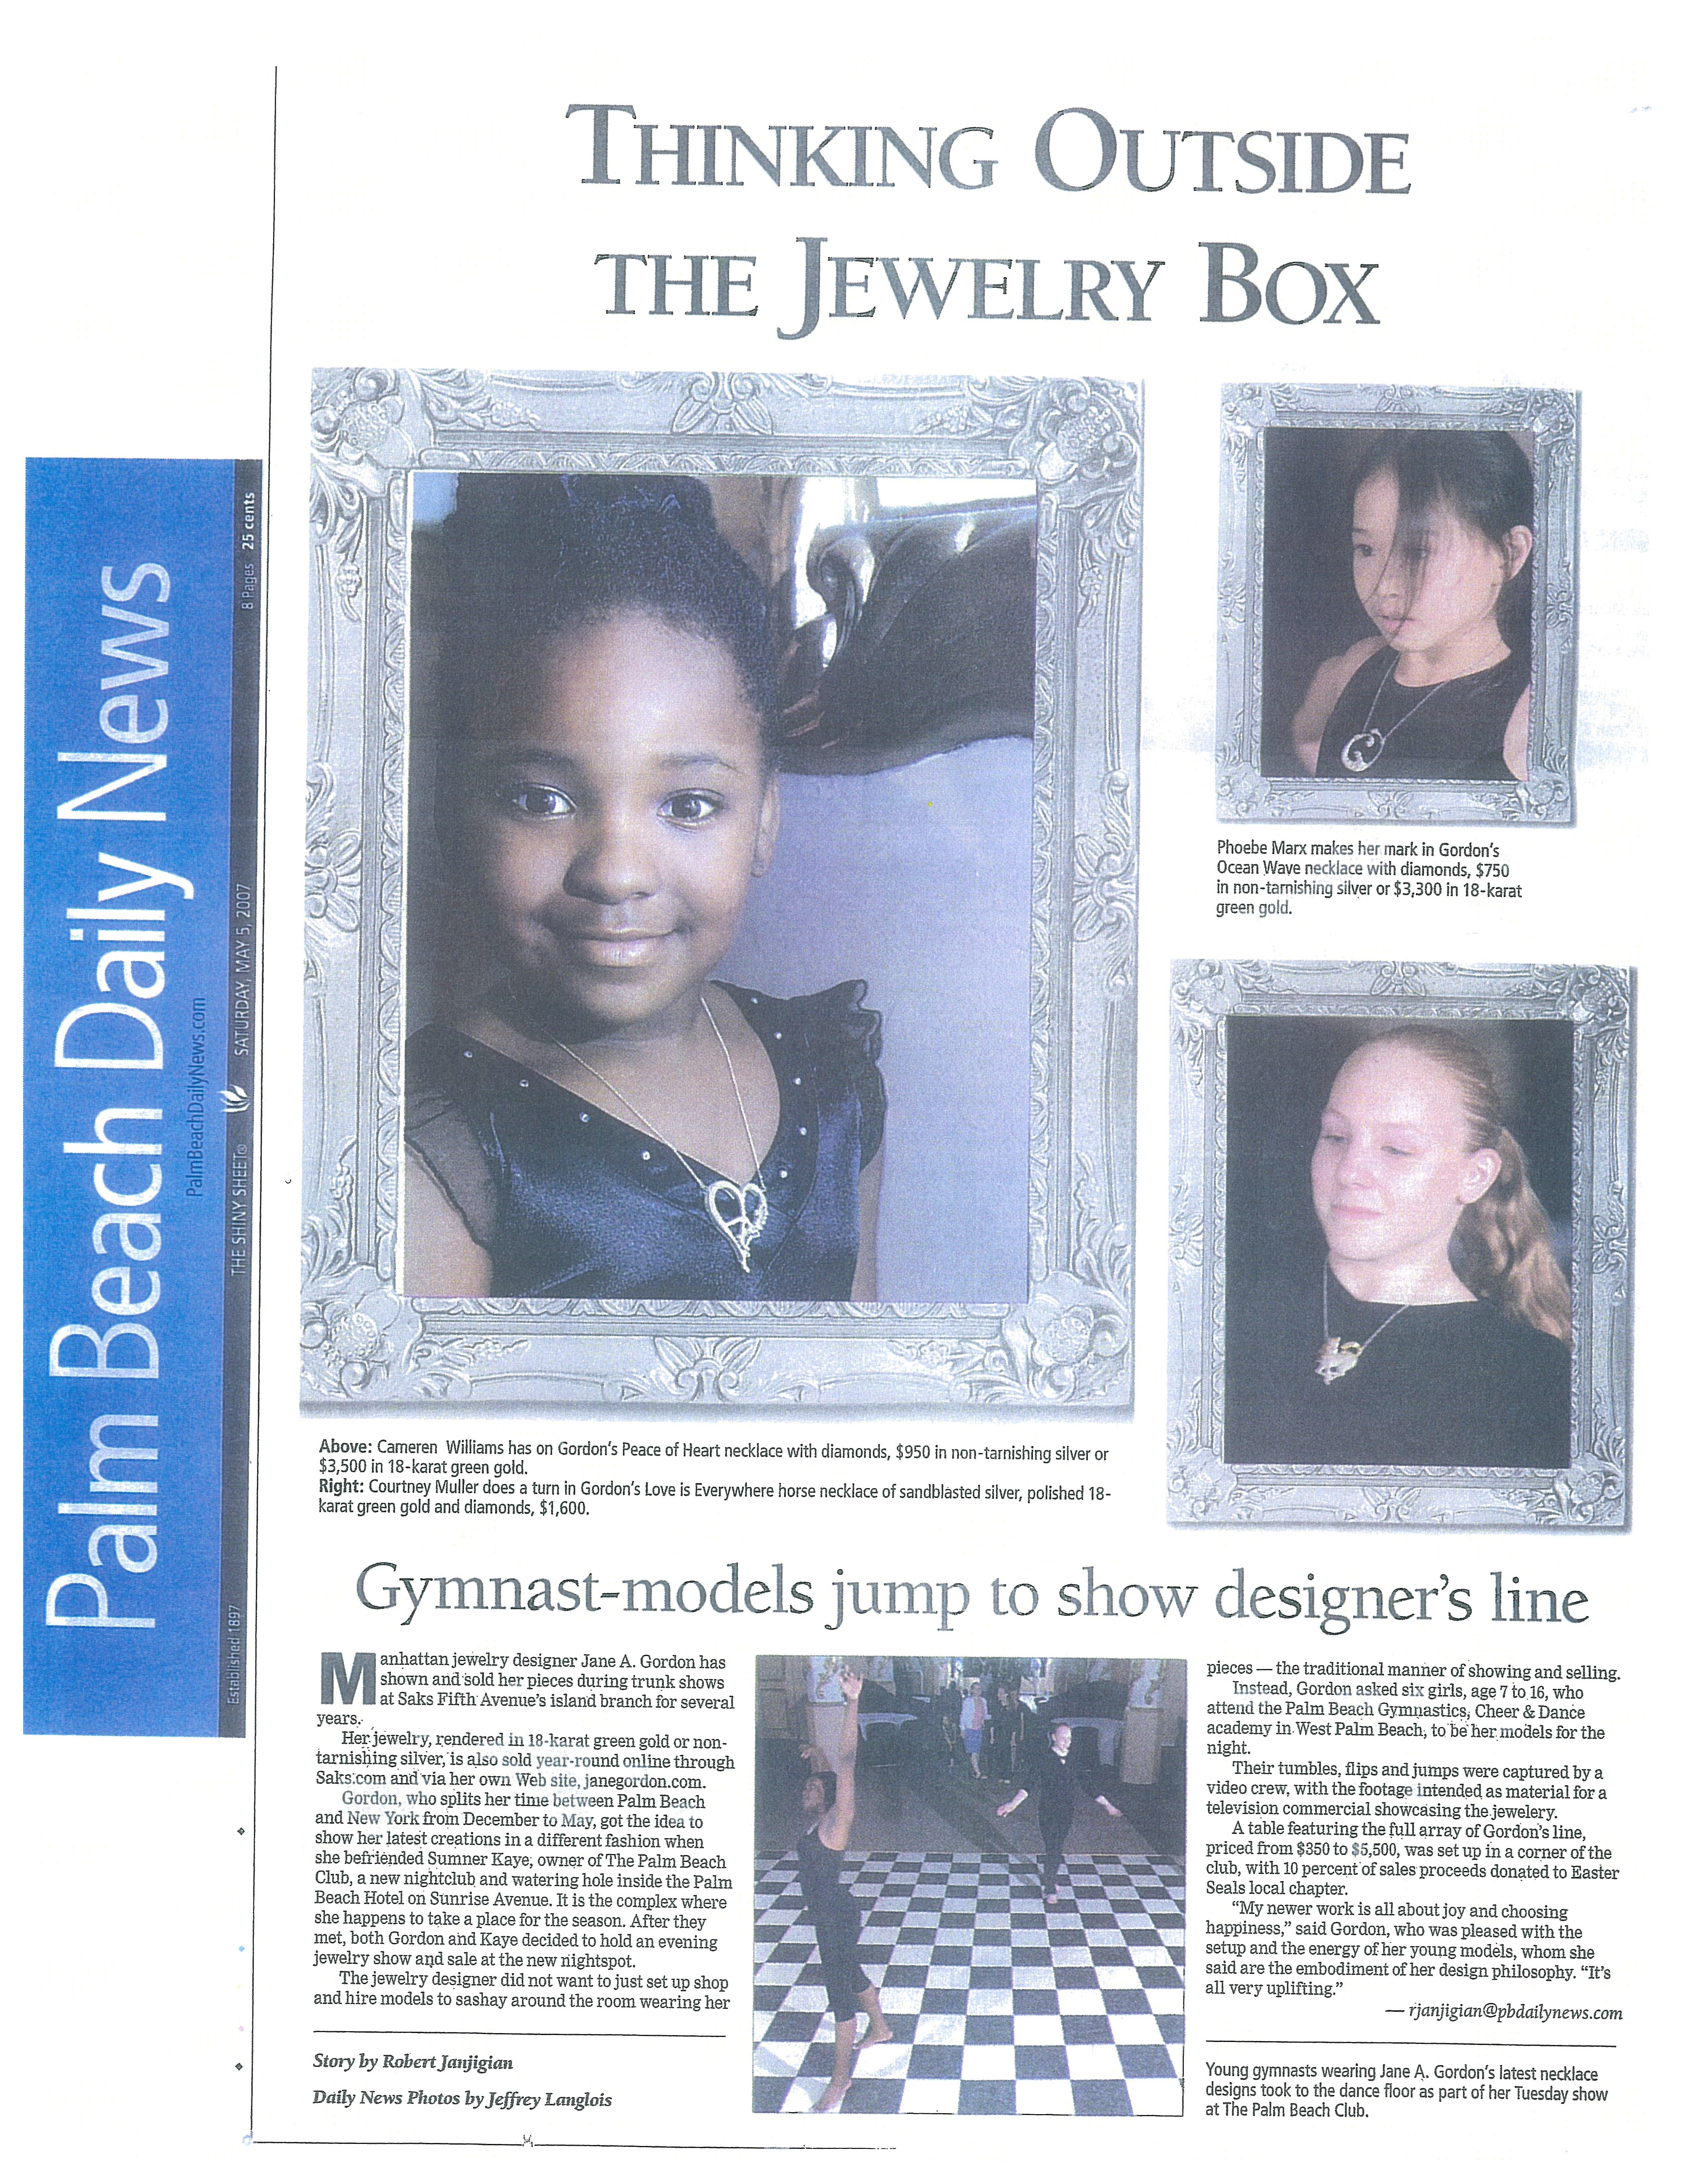 palm-beach-daily-news-shiny-sheet-jane-a-gordon-thinking-outside-the-jewelry-box-janegordon-com.jpg